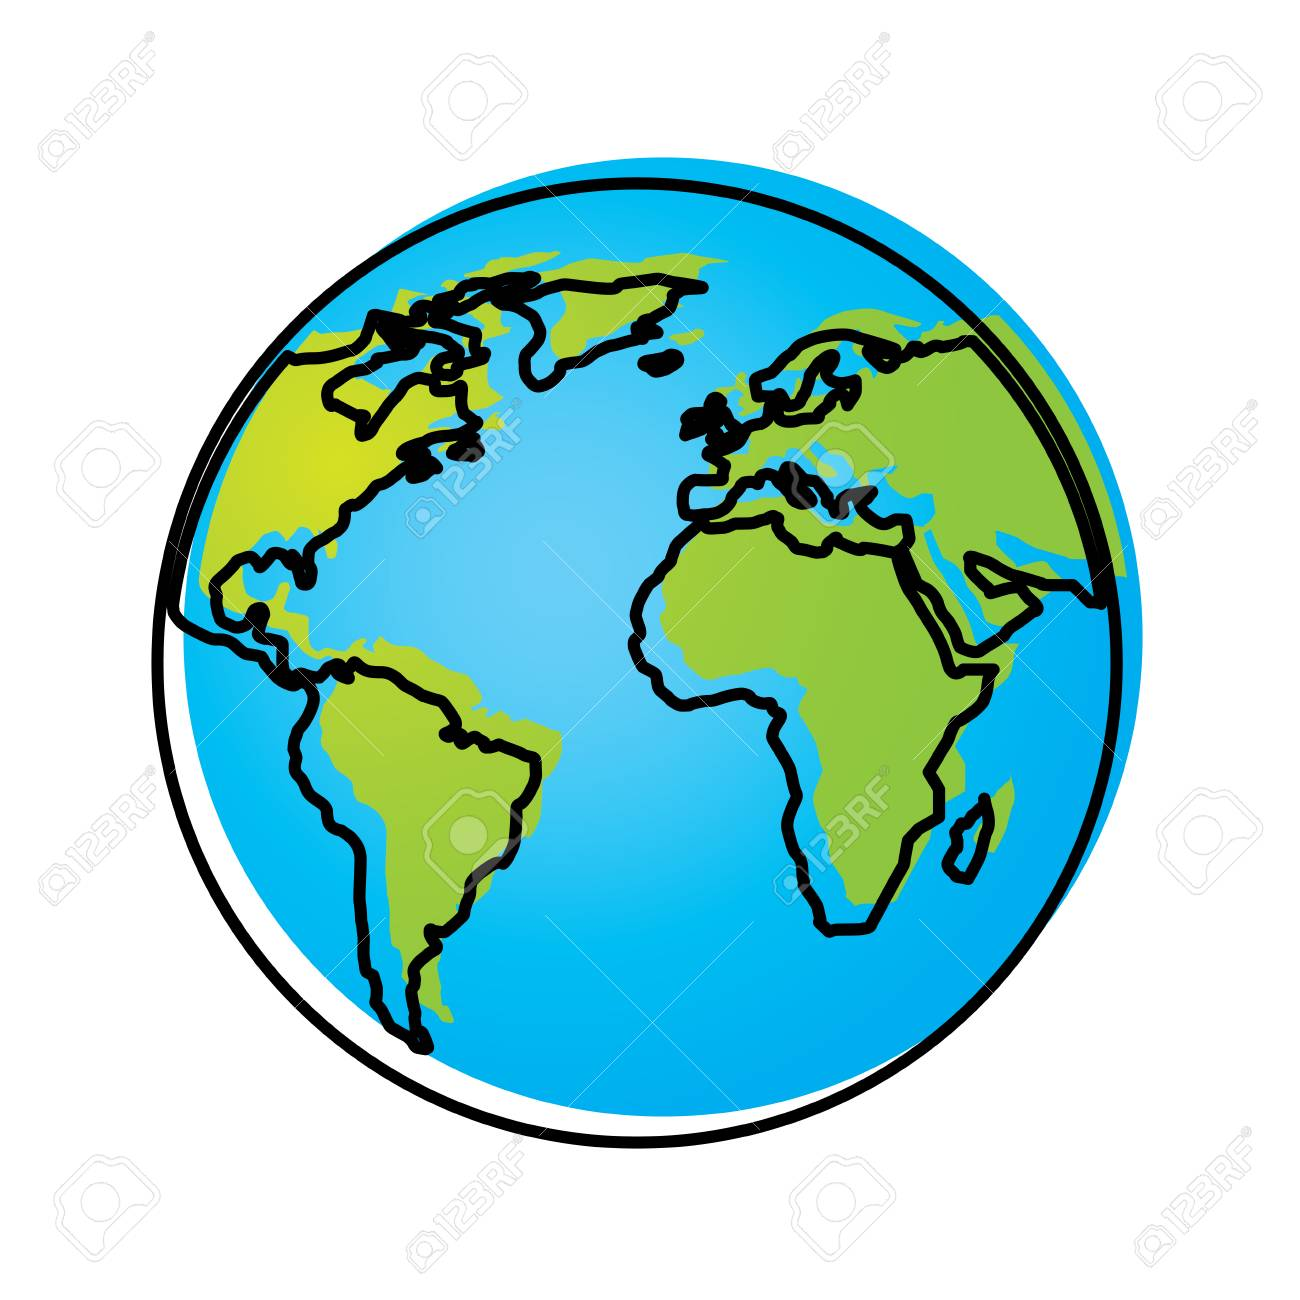 Globus Karte.Stock Photo